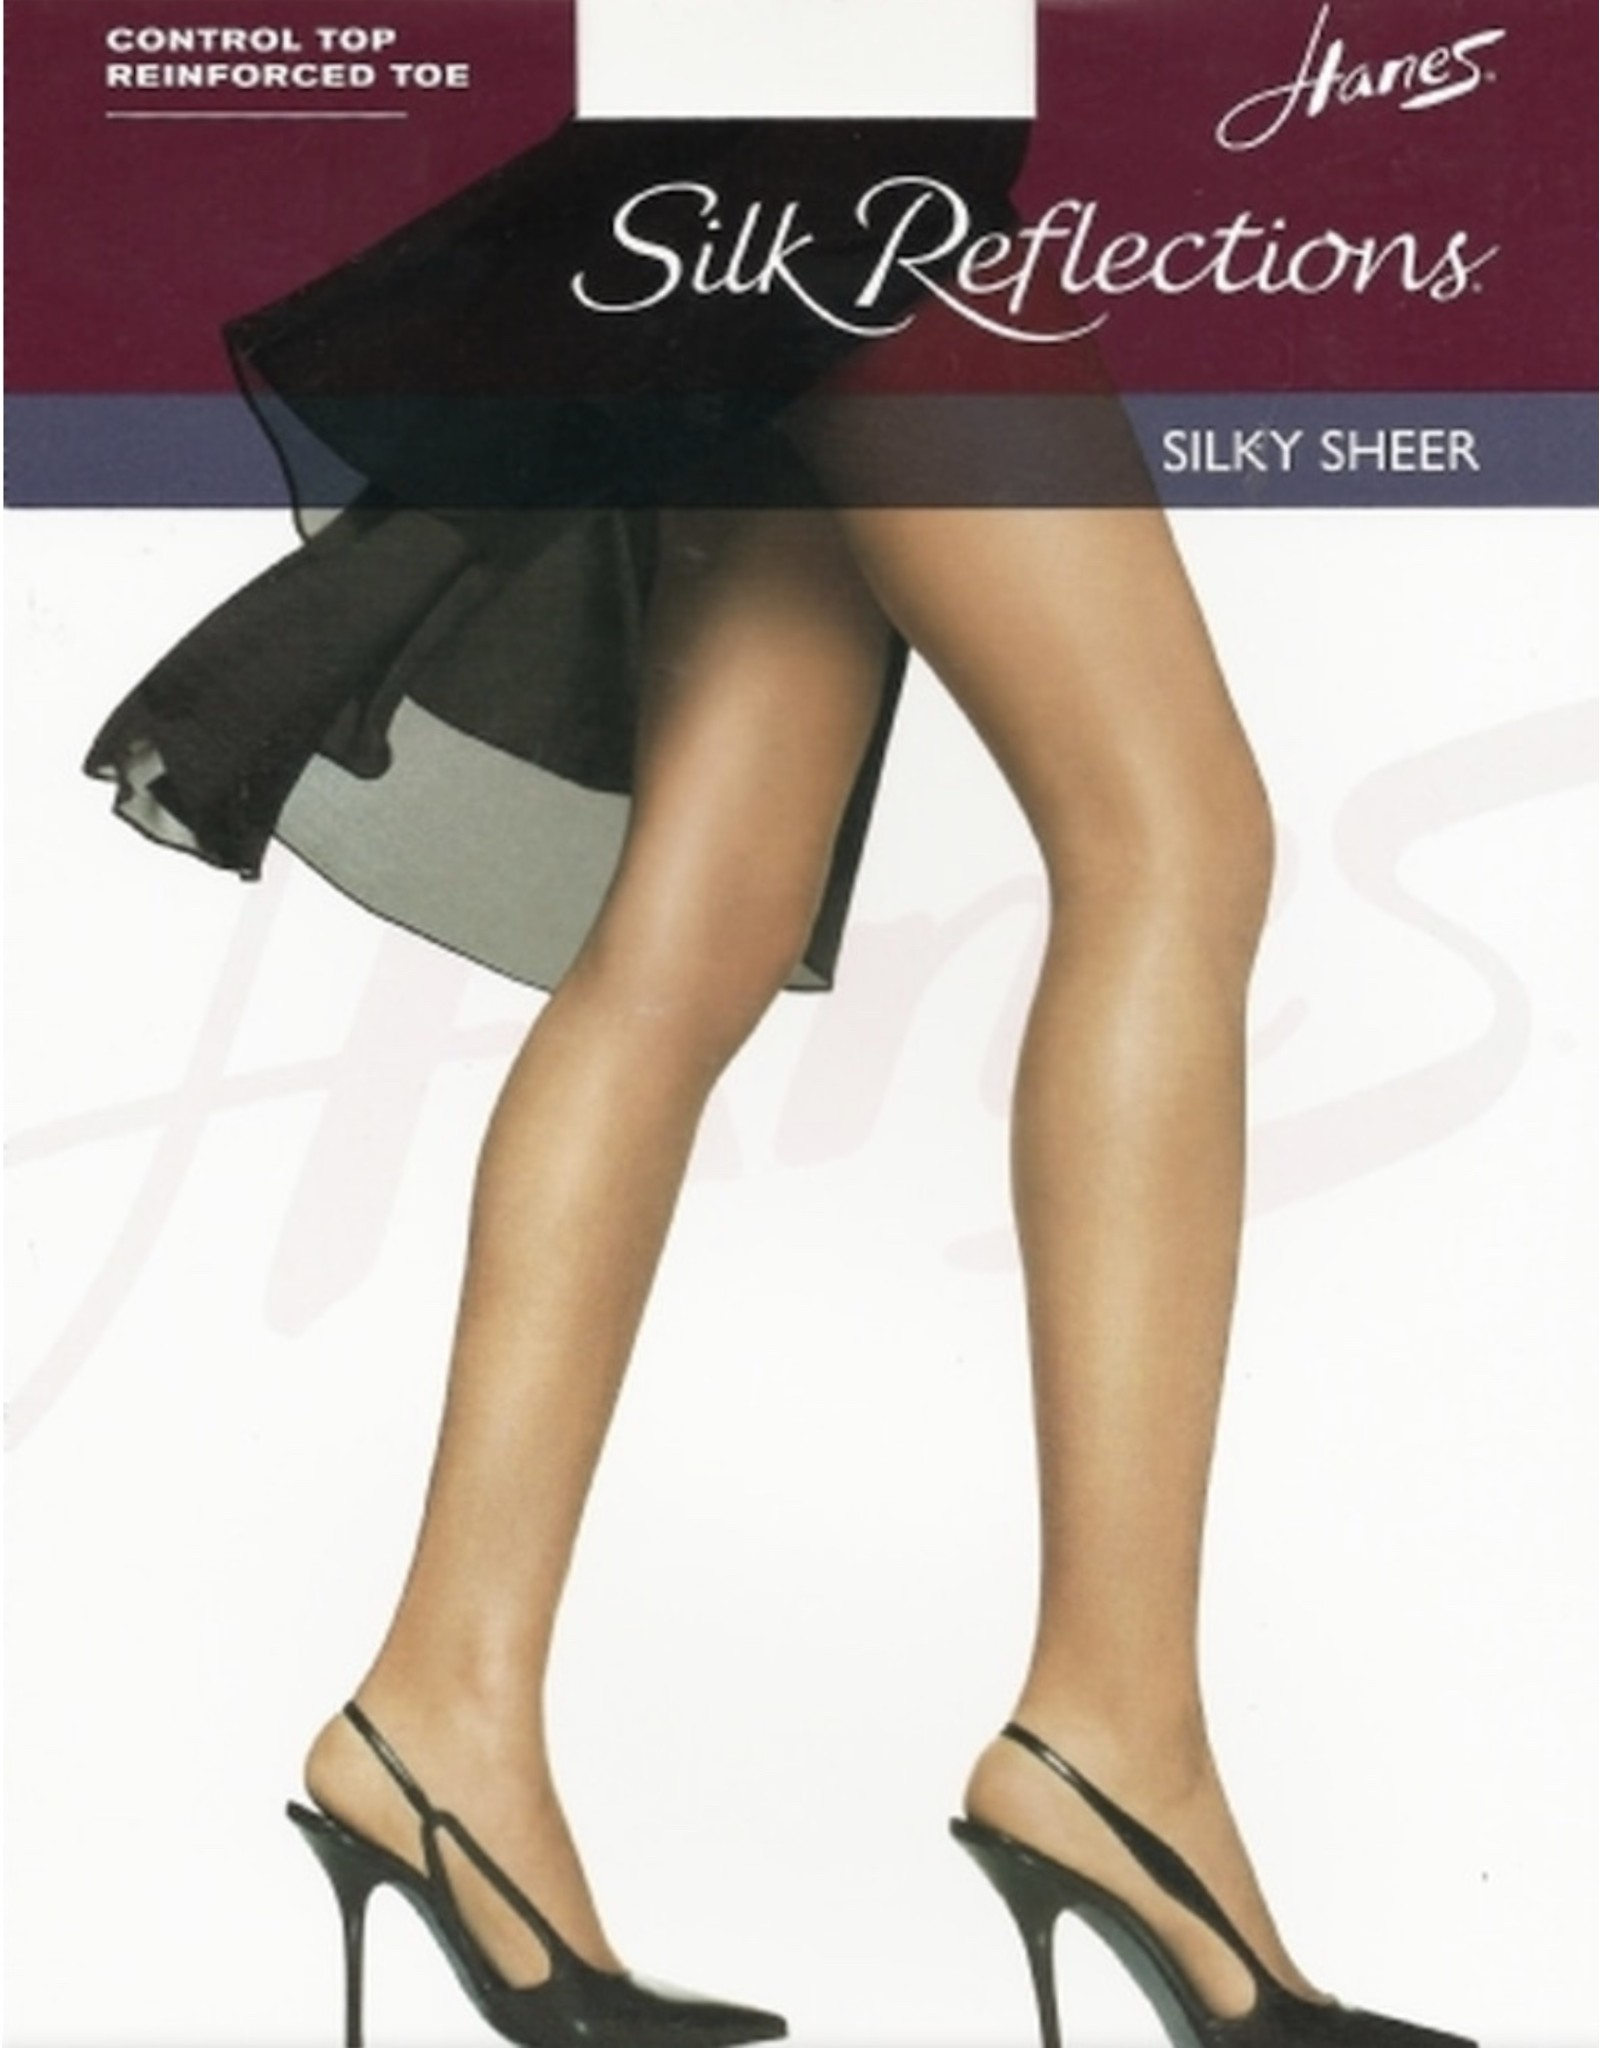 Hanes Hanes Women's Silky Sheer Control Top Reinforced Toe Pantyhose 718